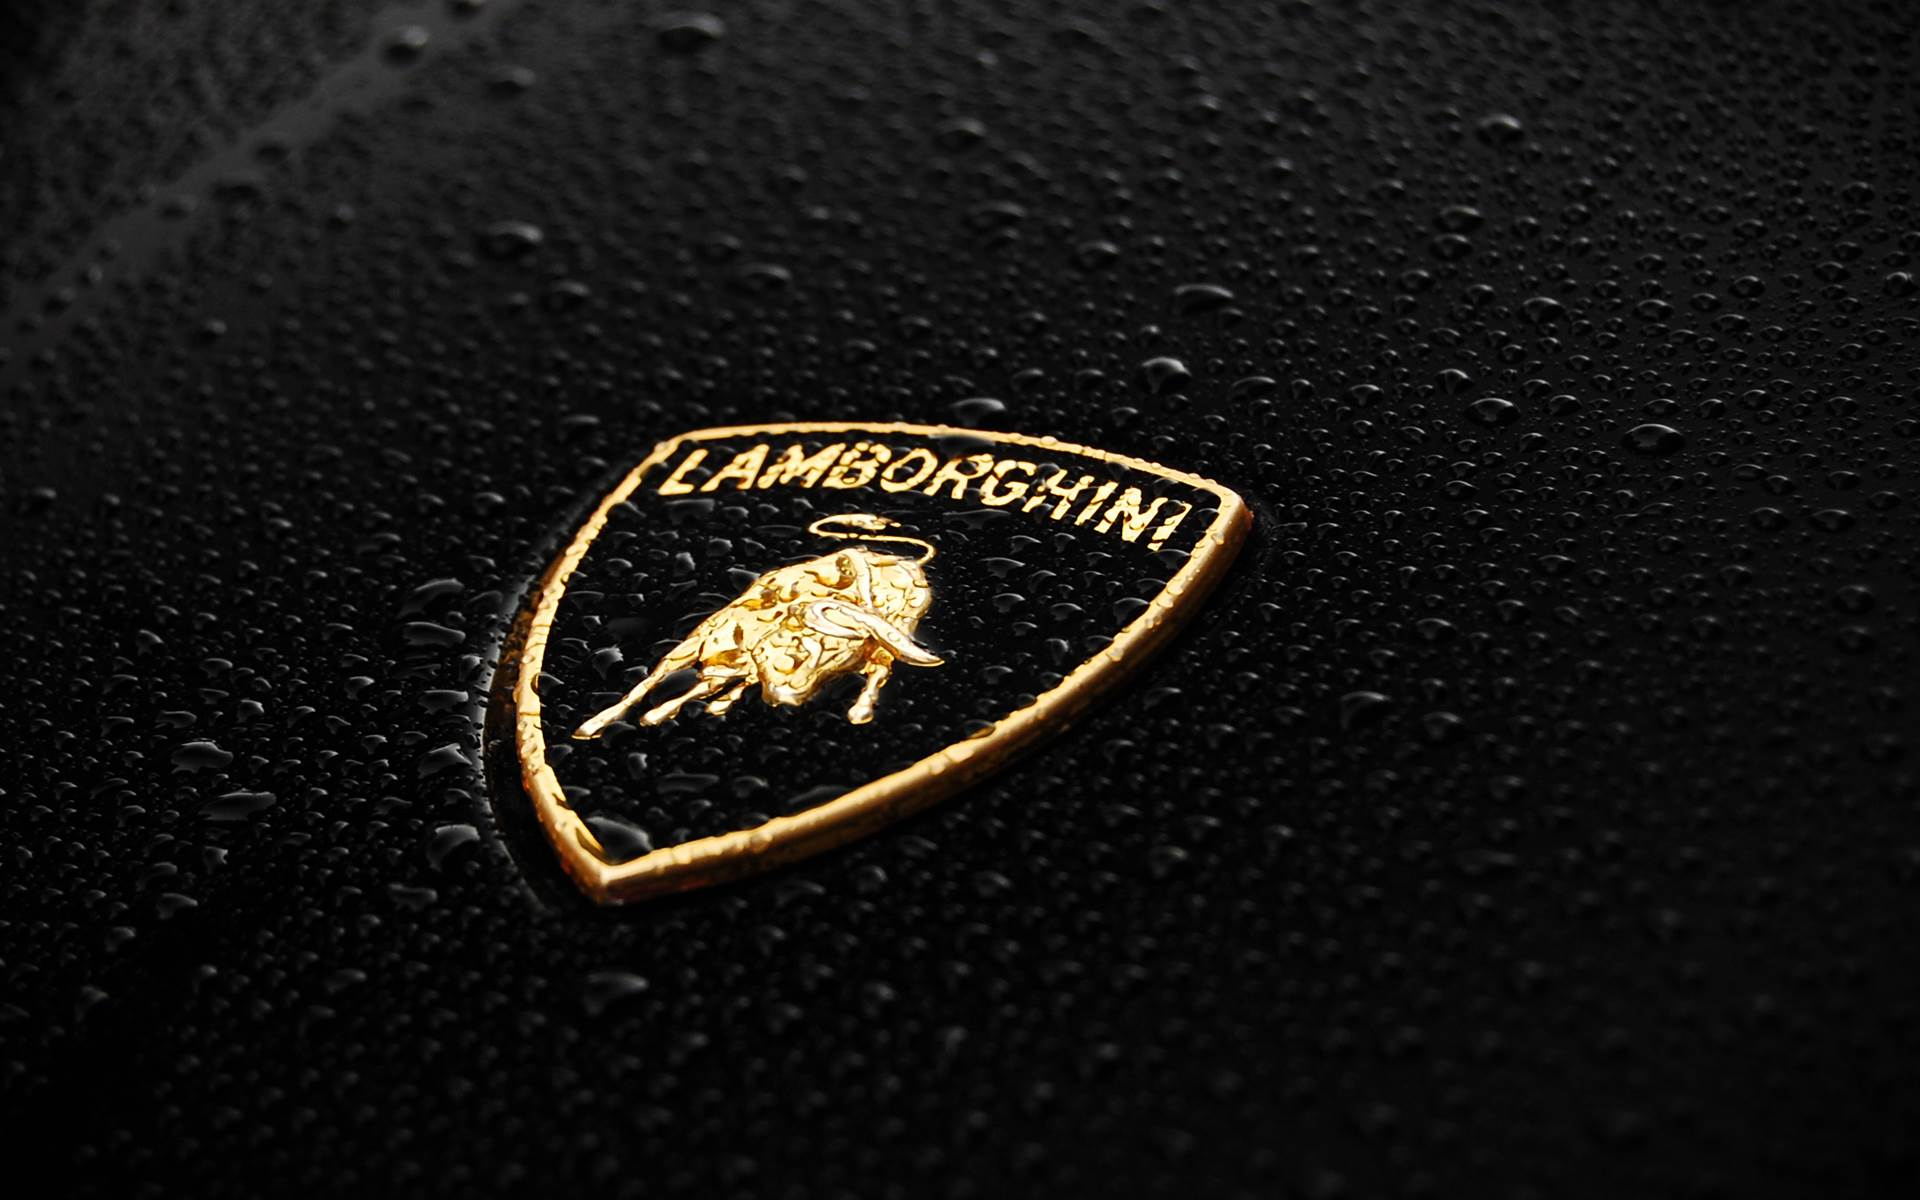 Yellow Lamborghini Aventador Wallpaper Hd Car Wallpapers 1920x1200